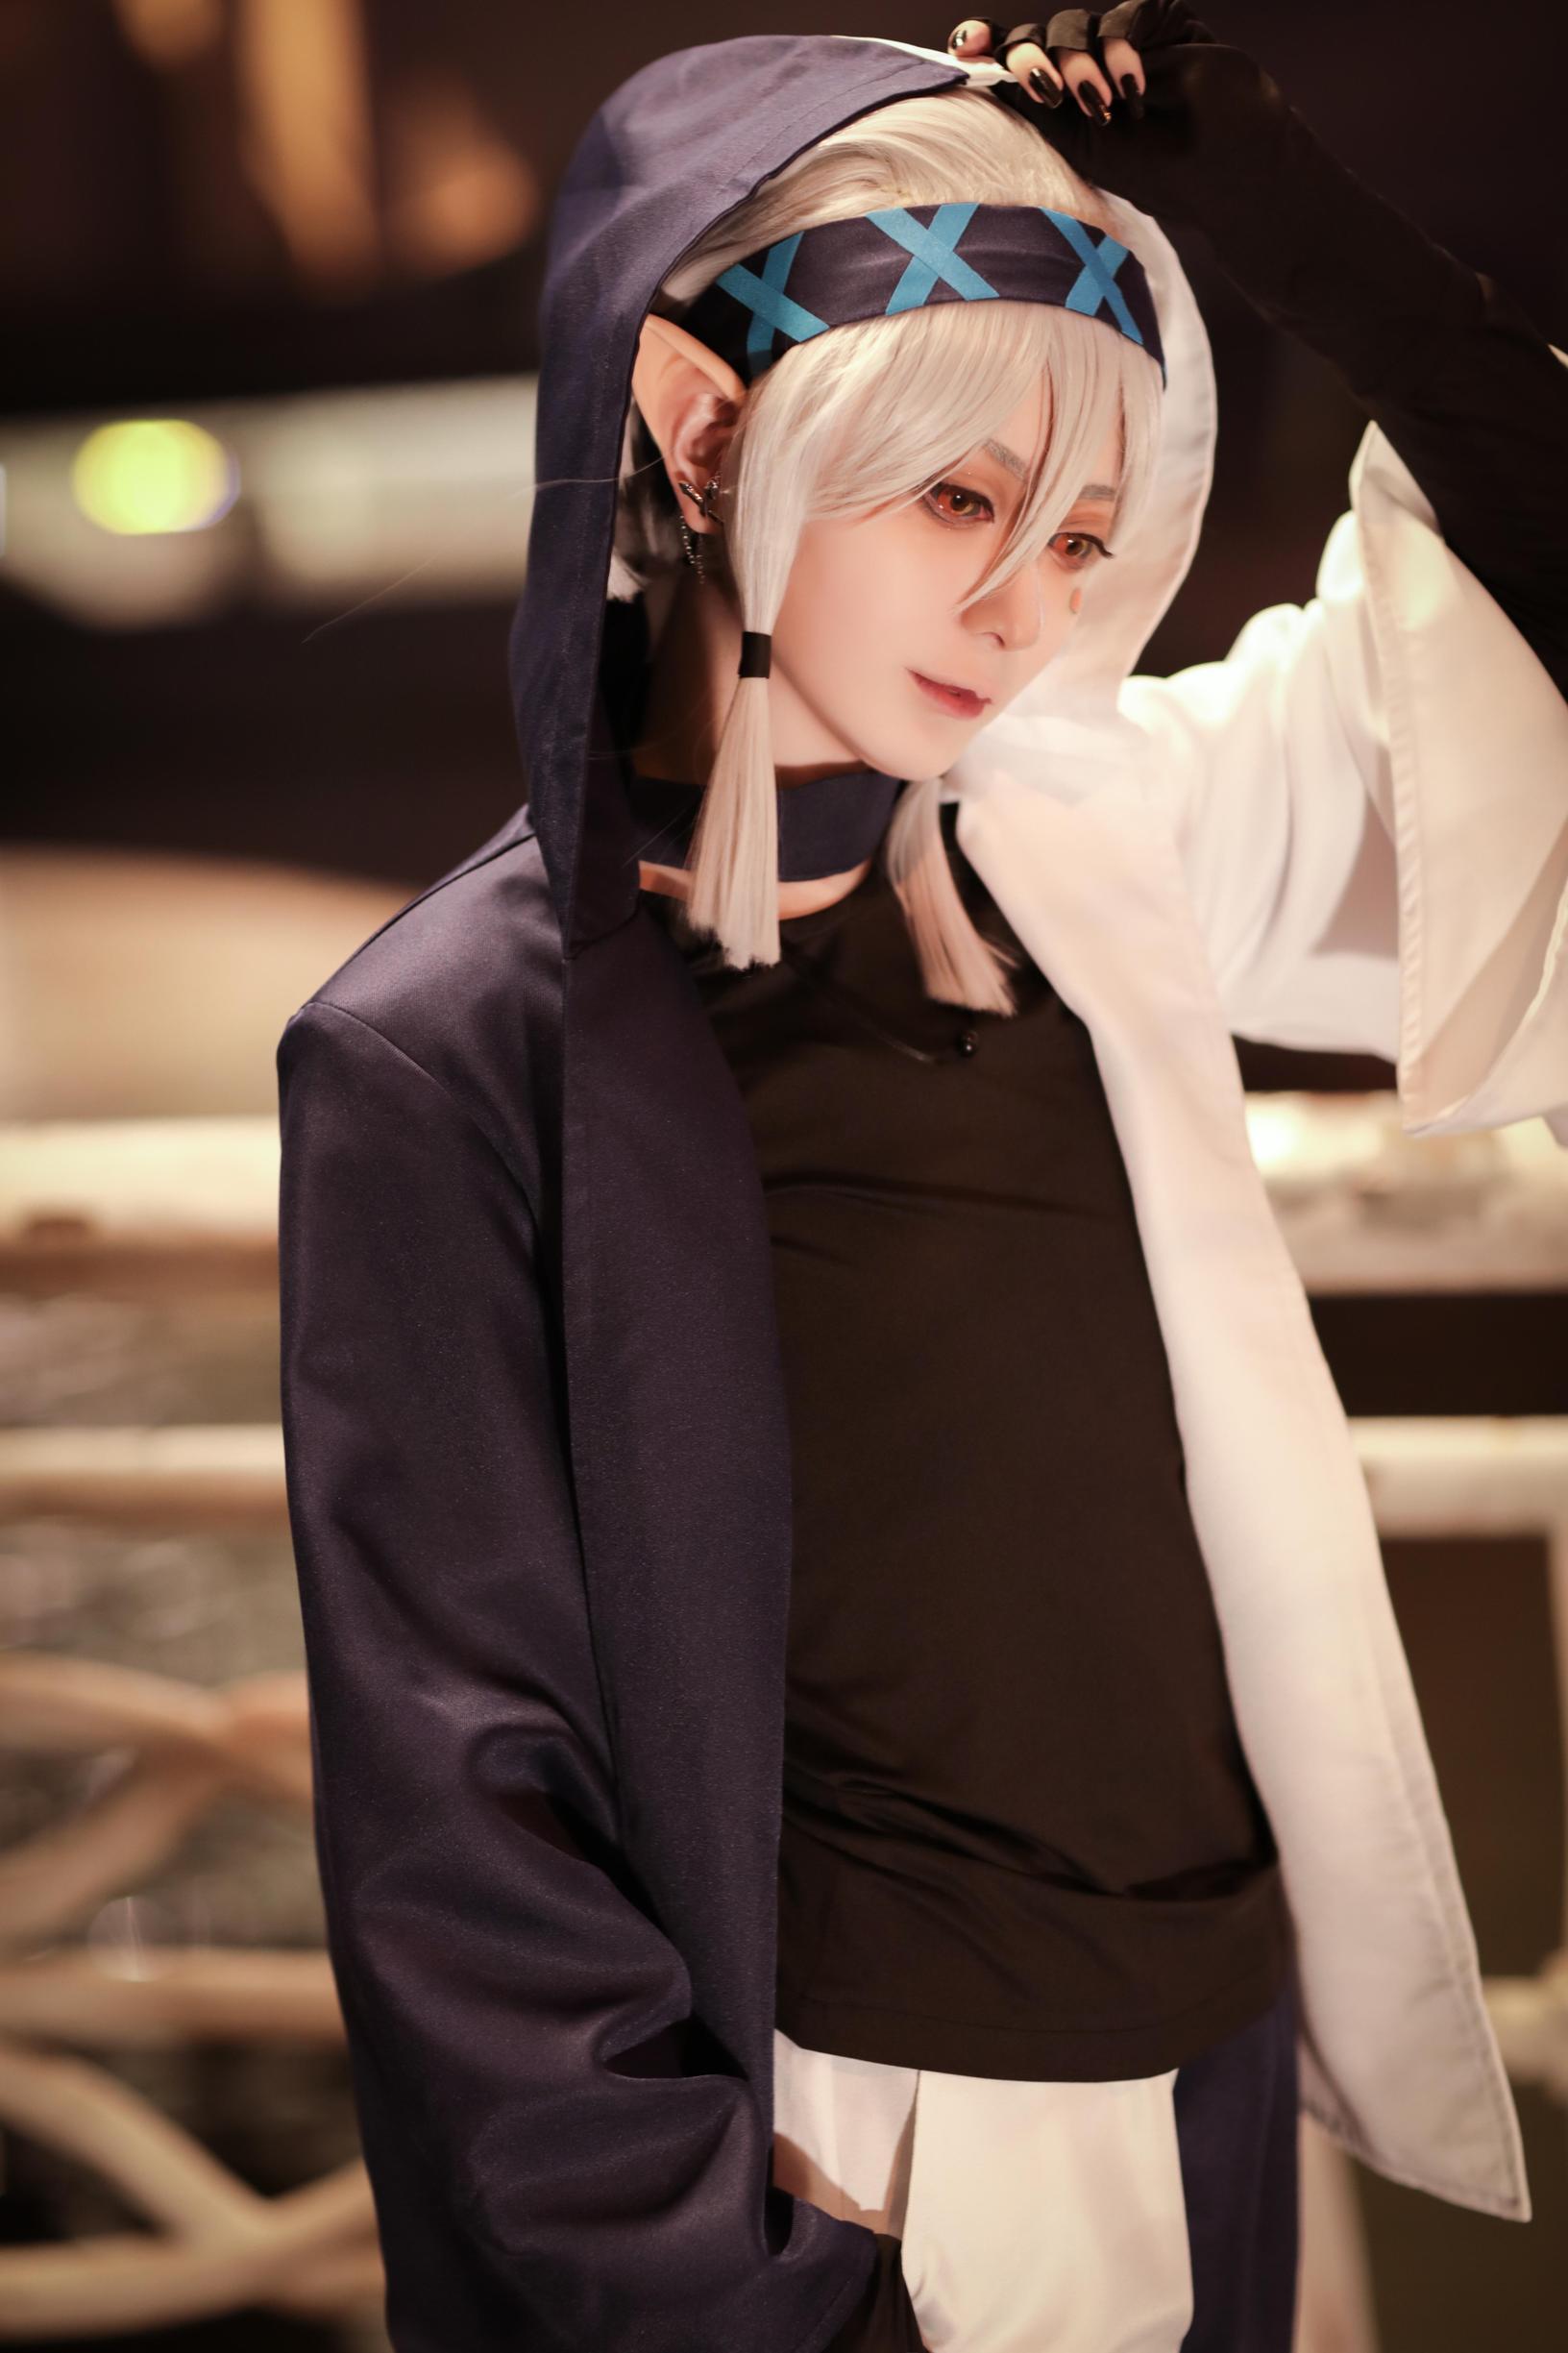 《凹凸世界》正片cosplay【CN:等待幸运の恒星】-第10张